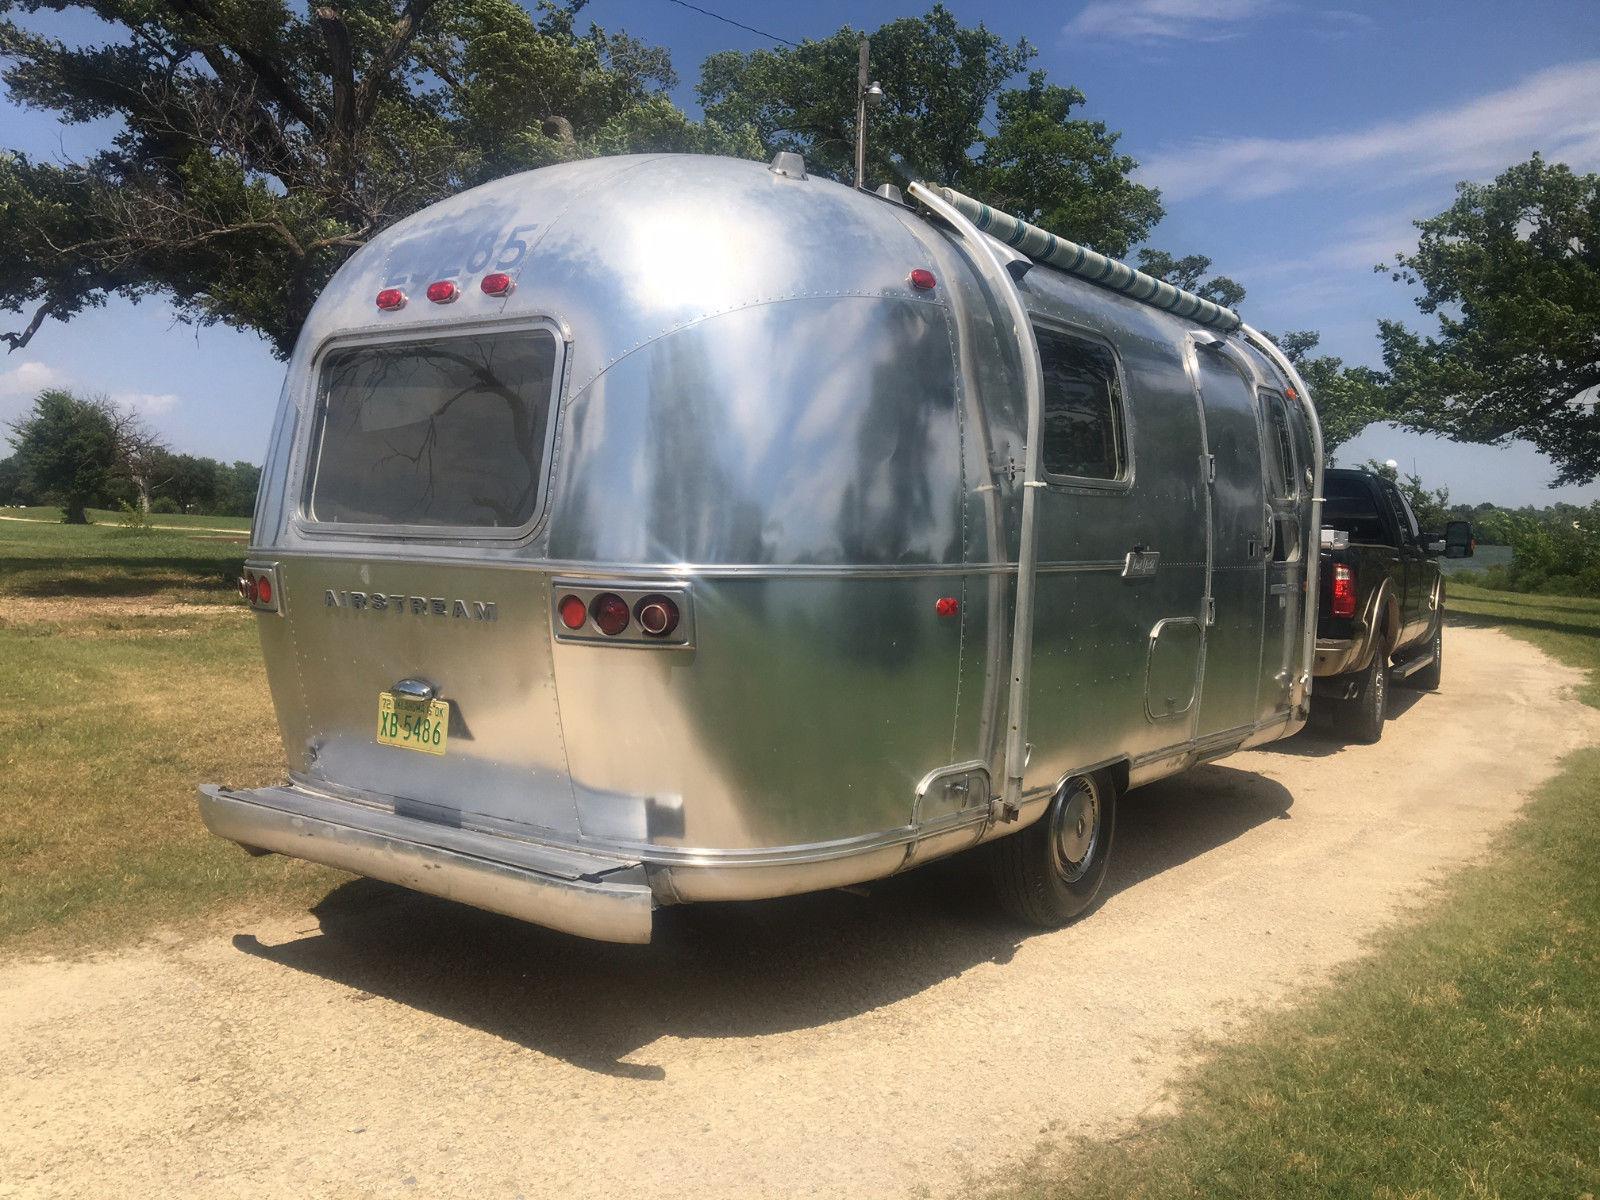 1972 Airstream Globetrotter camper trailer for sale